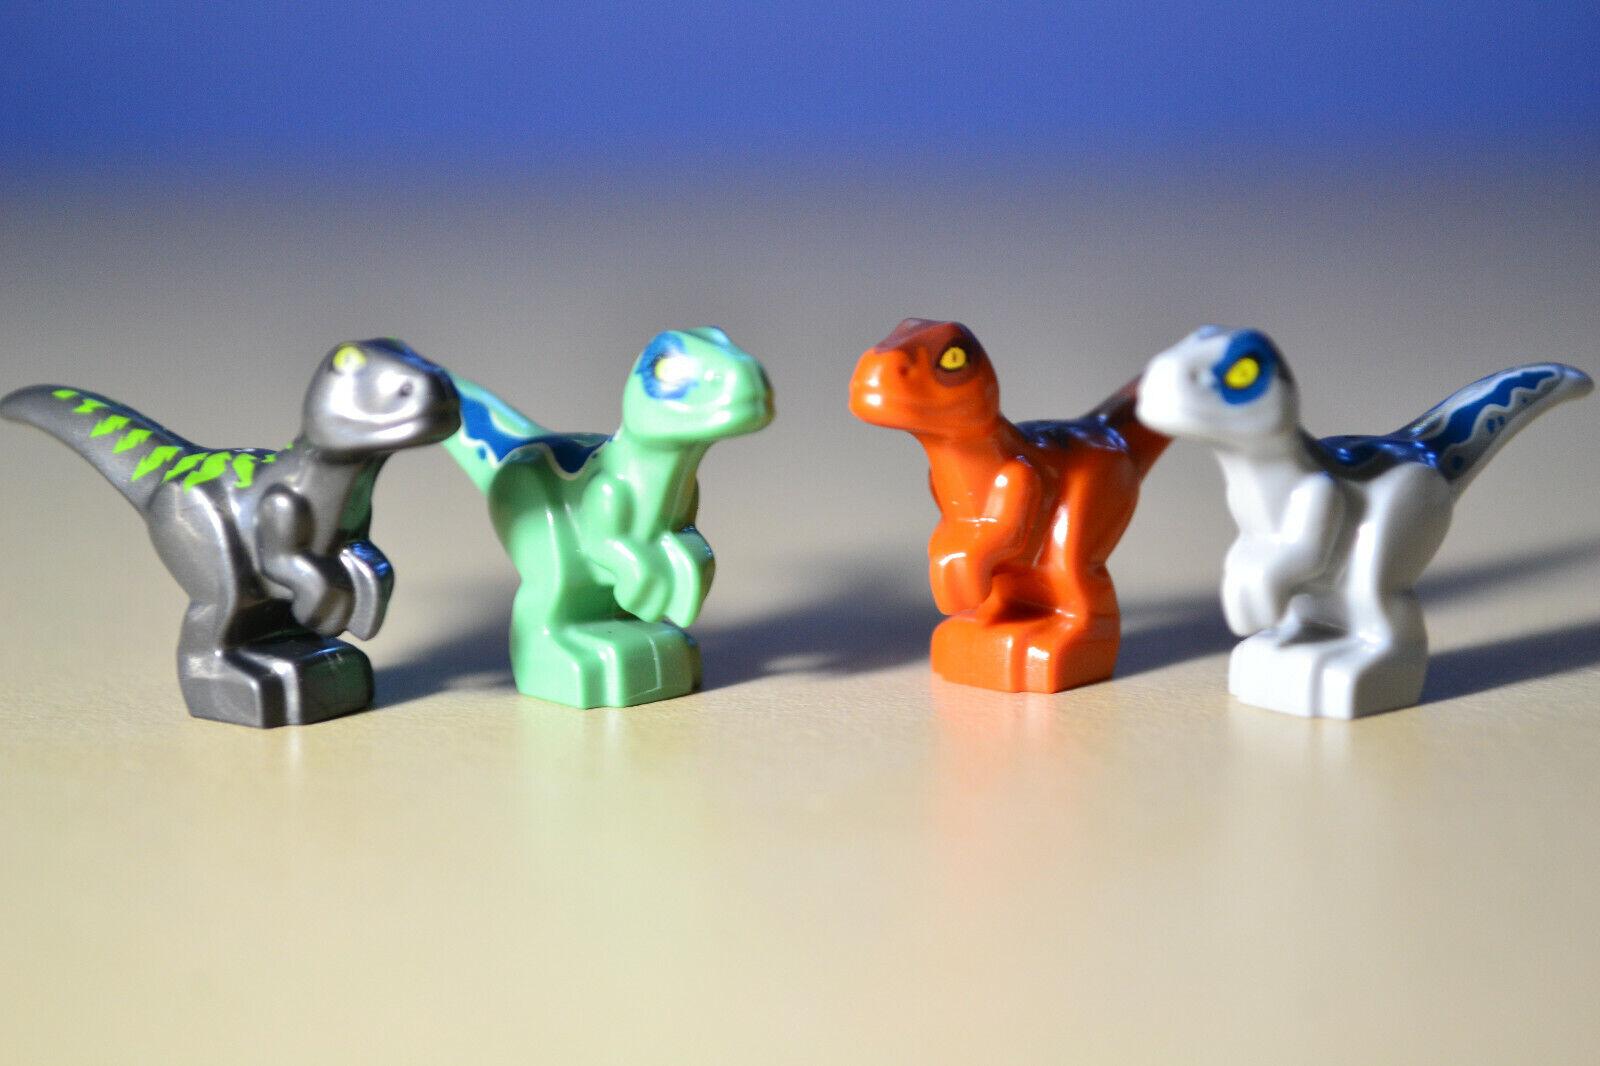 Lego Baby Dino Jurassic World Baby Raptors Dinosaurs Lot Of 4 - $13.95